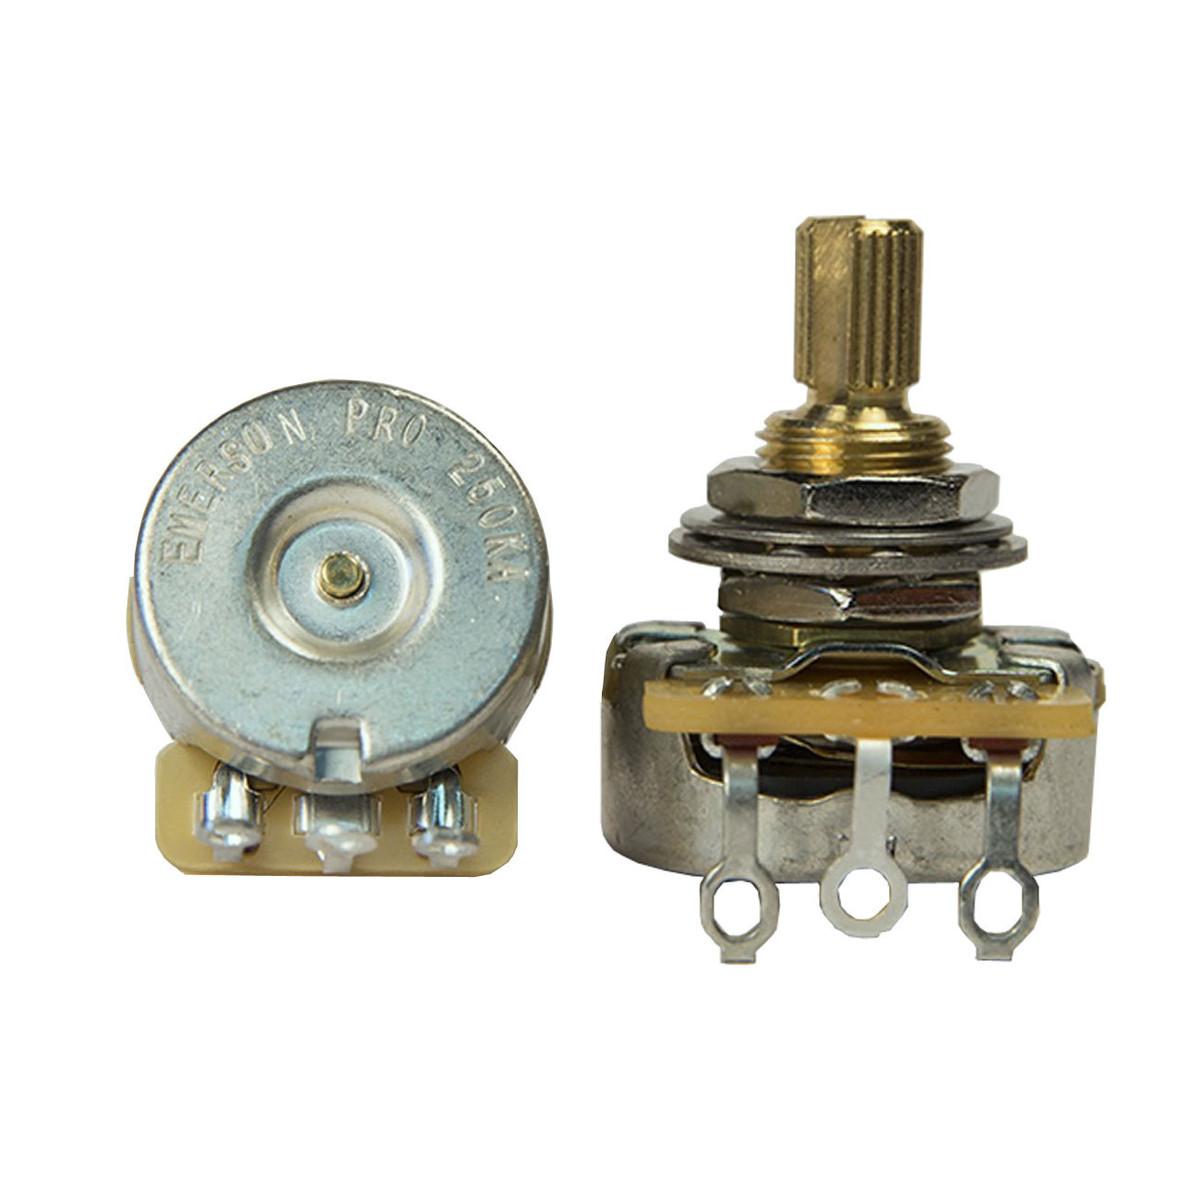 Image of Emerson Custom CTS 250K Short Split Shaft Pro Potentiometer